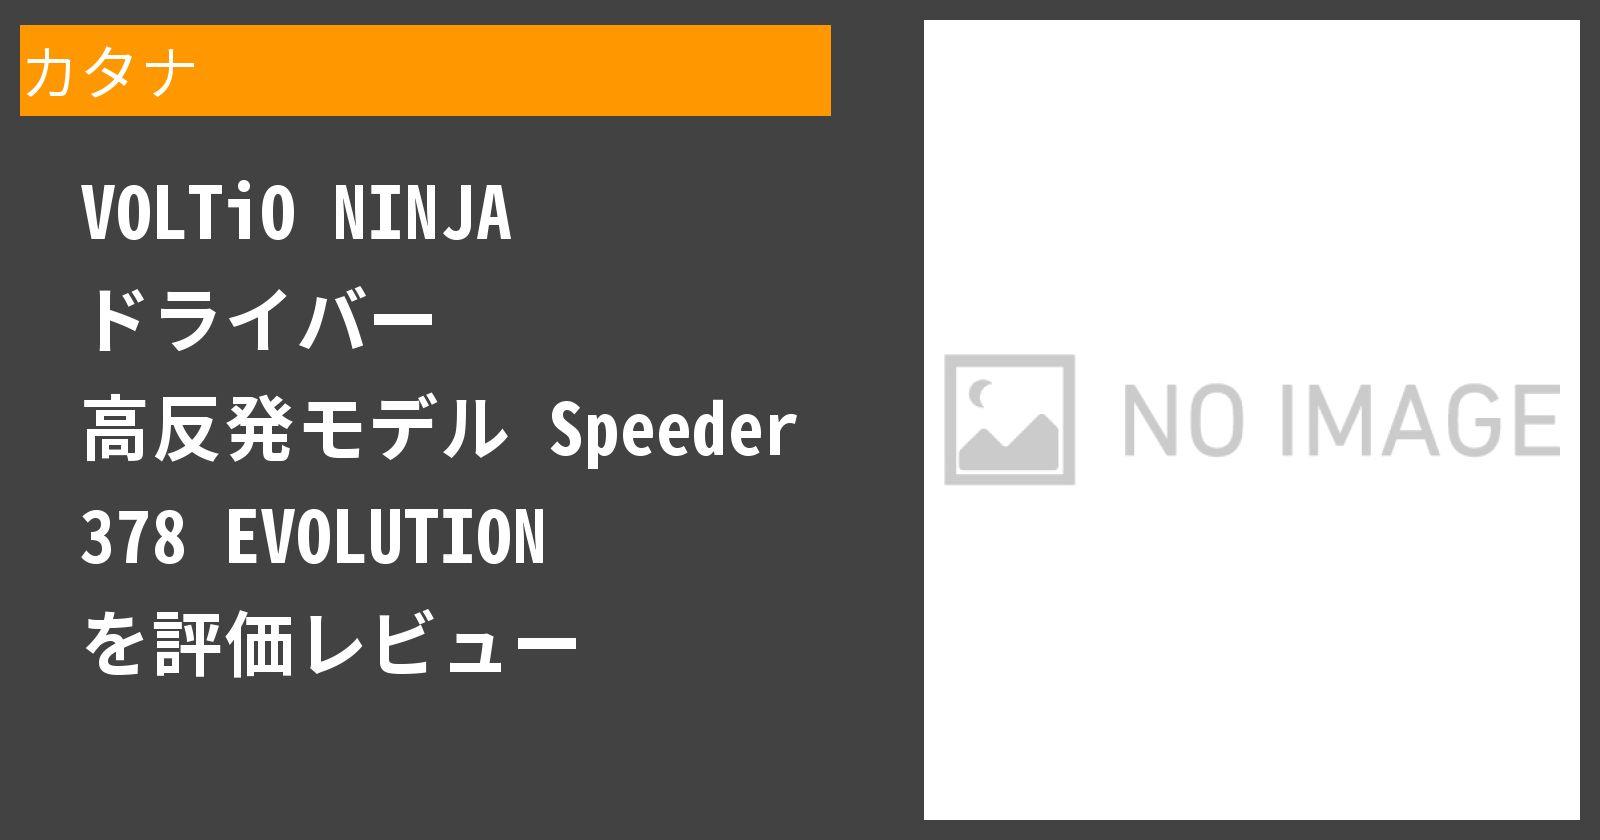 VOLTiO NINJA ドライバー 高反発モデル Speeder 378 EVOLUTIONを徹底評価